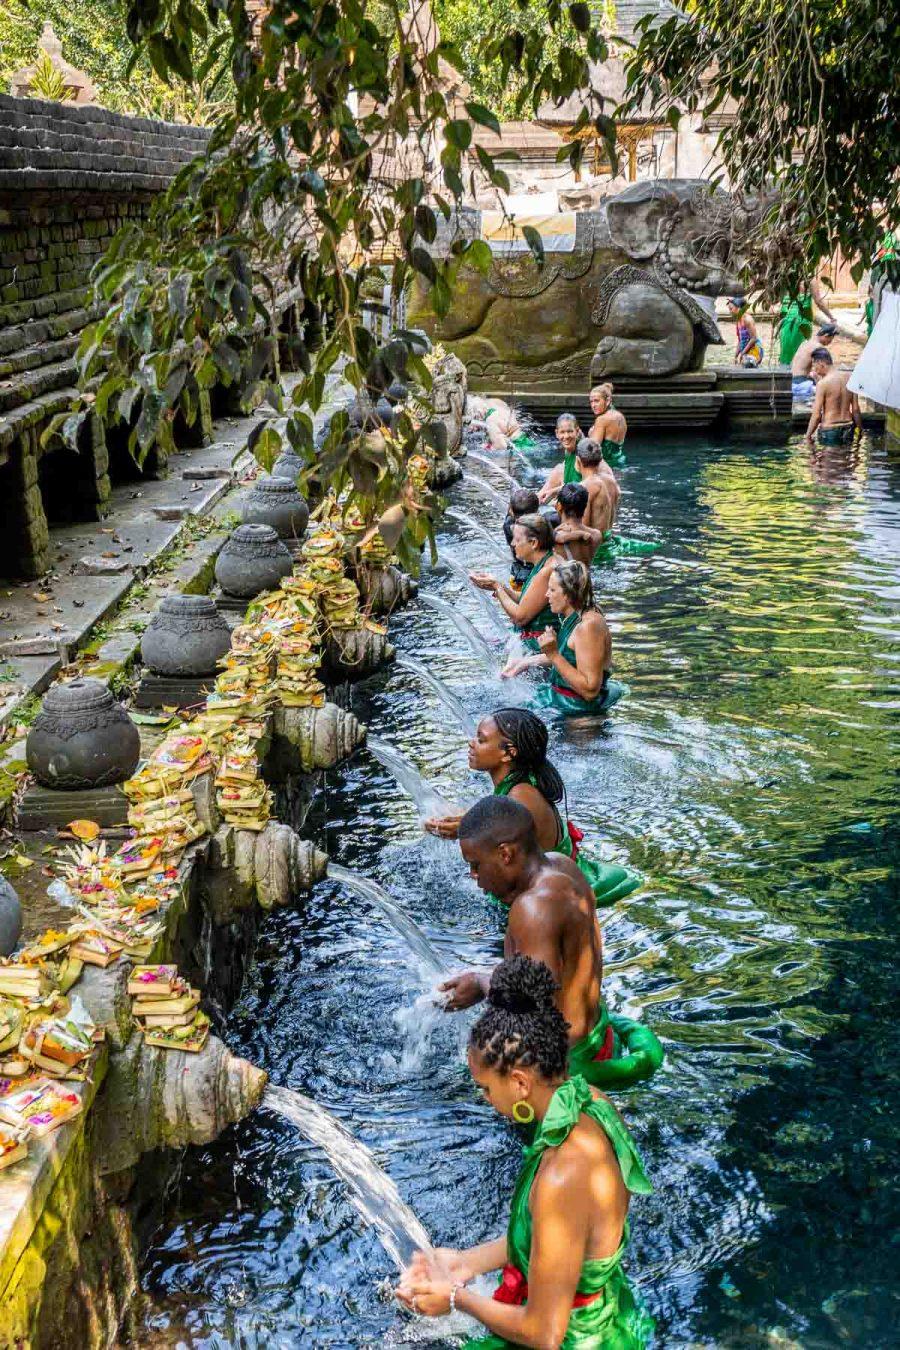 Cleansing ritual at Pura Tirta Empul Temple, Bali